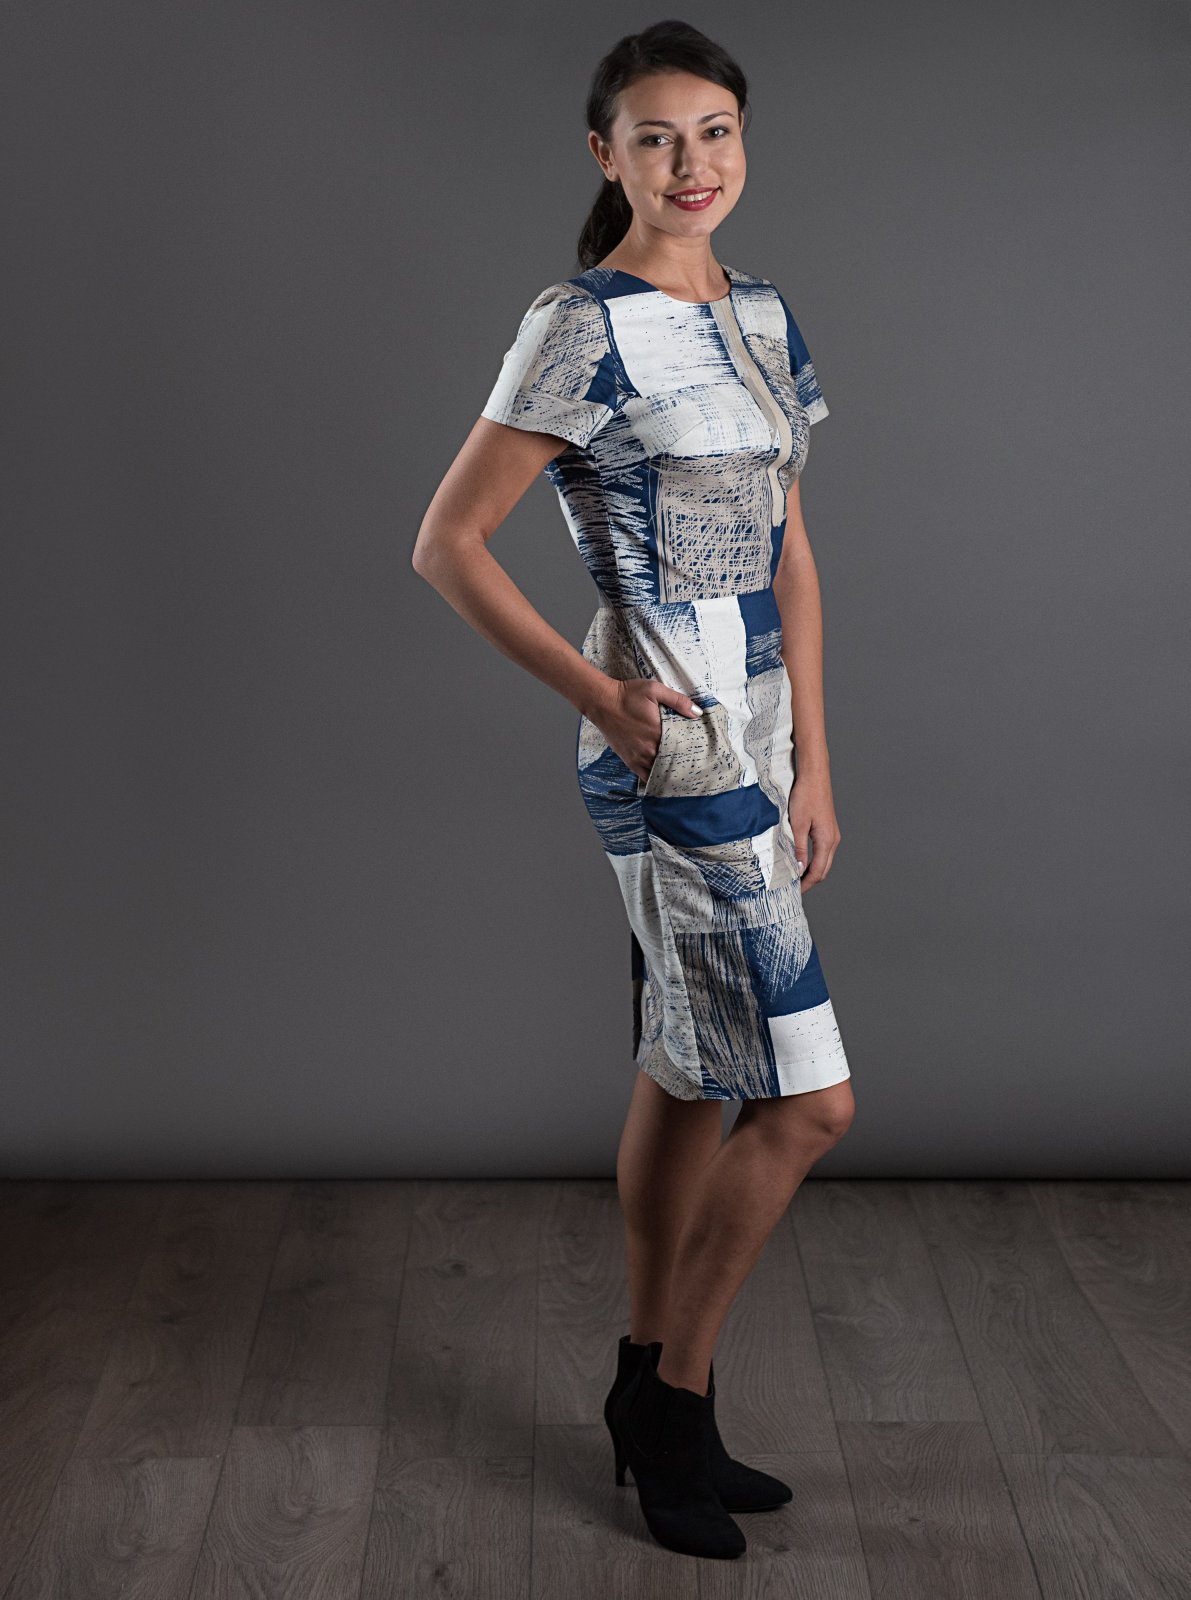 The Shift Dress - The Avid Seamstress